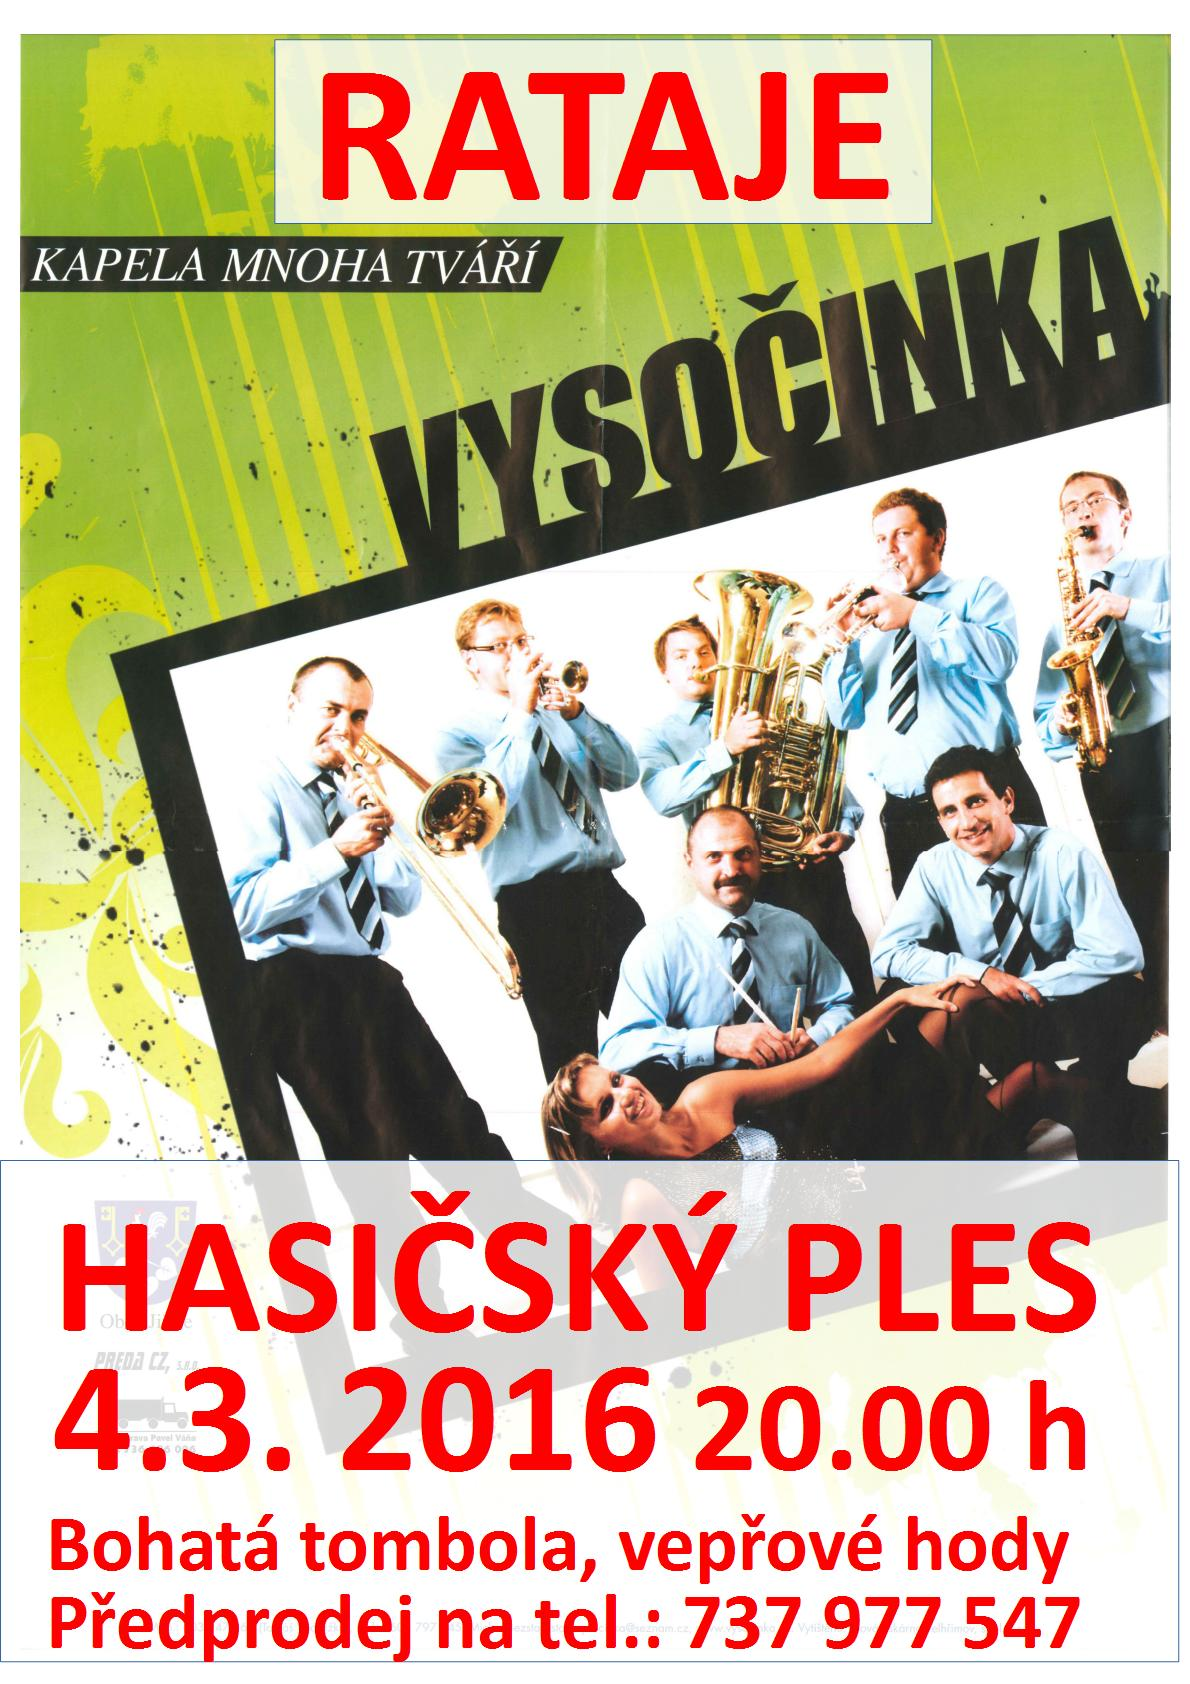 Hasičský ples 4.3. 2016